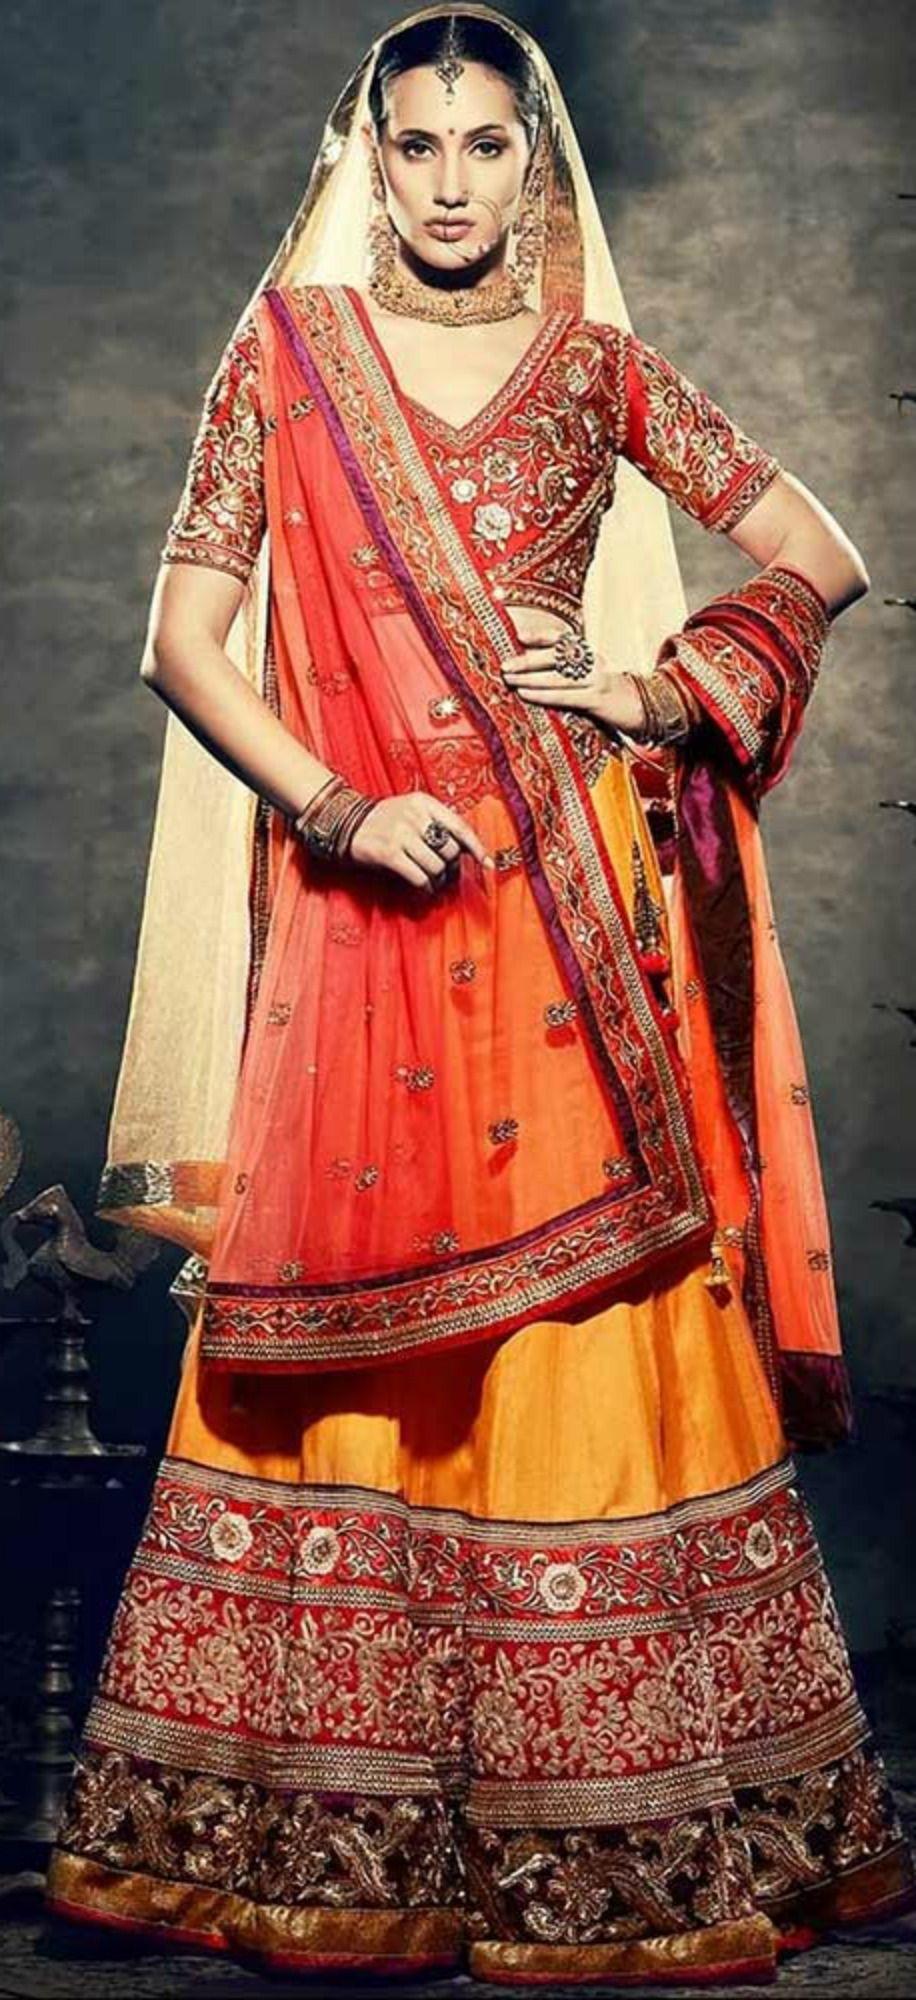 547a5e8db0 5 Best Stores To Get Bridal Lehenga On Rent In Delhi #bridal #wedding  #dresses